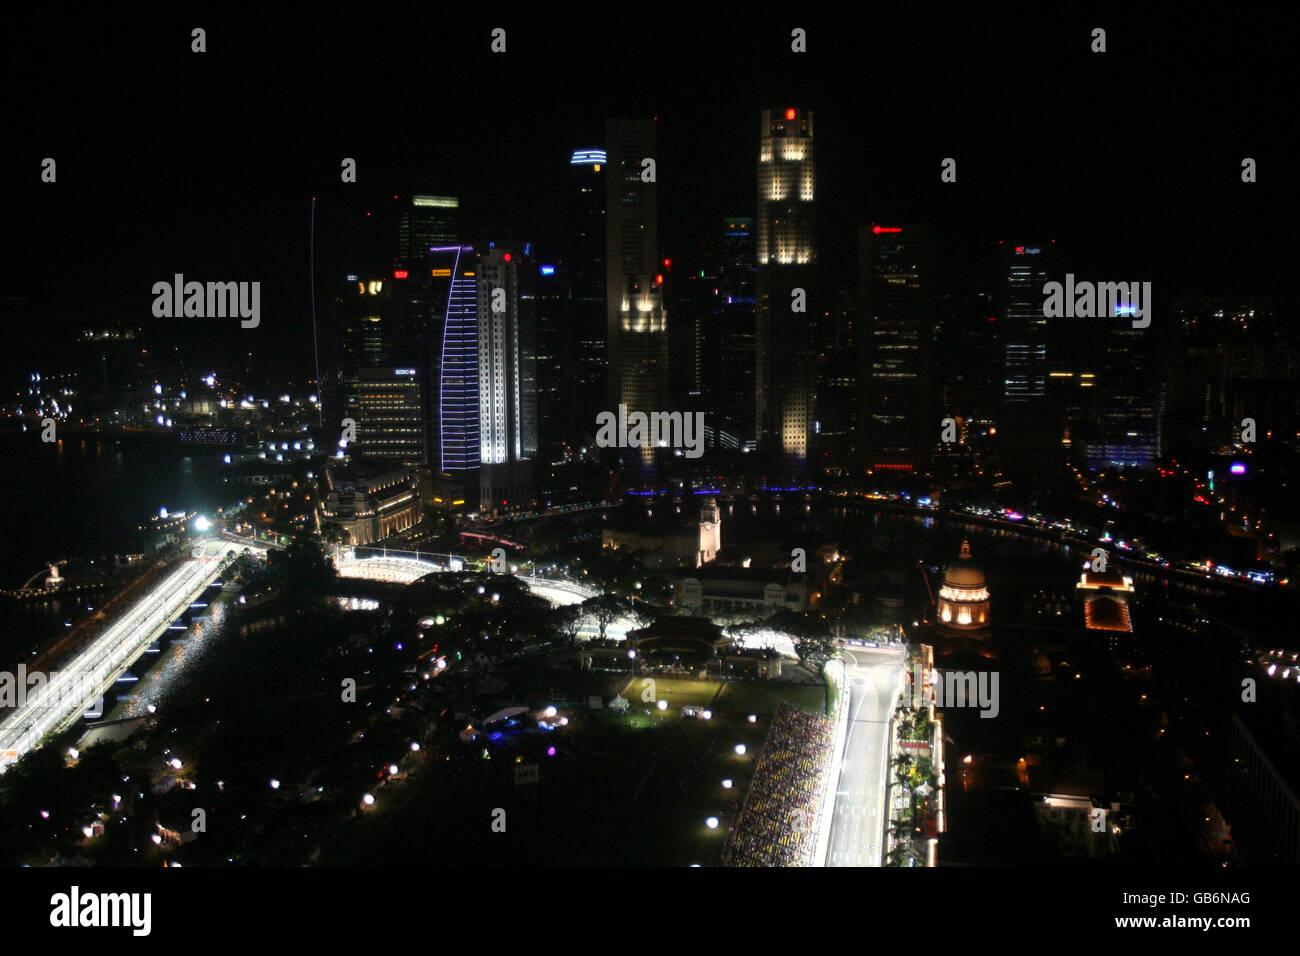 Circuito F1 Singapur : Automovilismo fórmula singtel gran premio de singapur